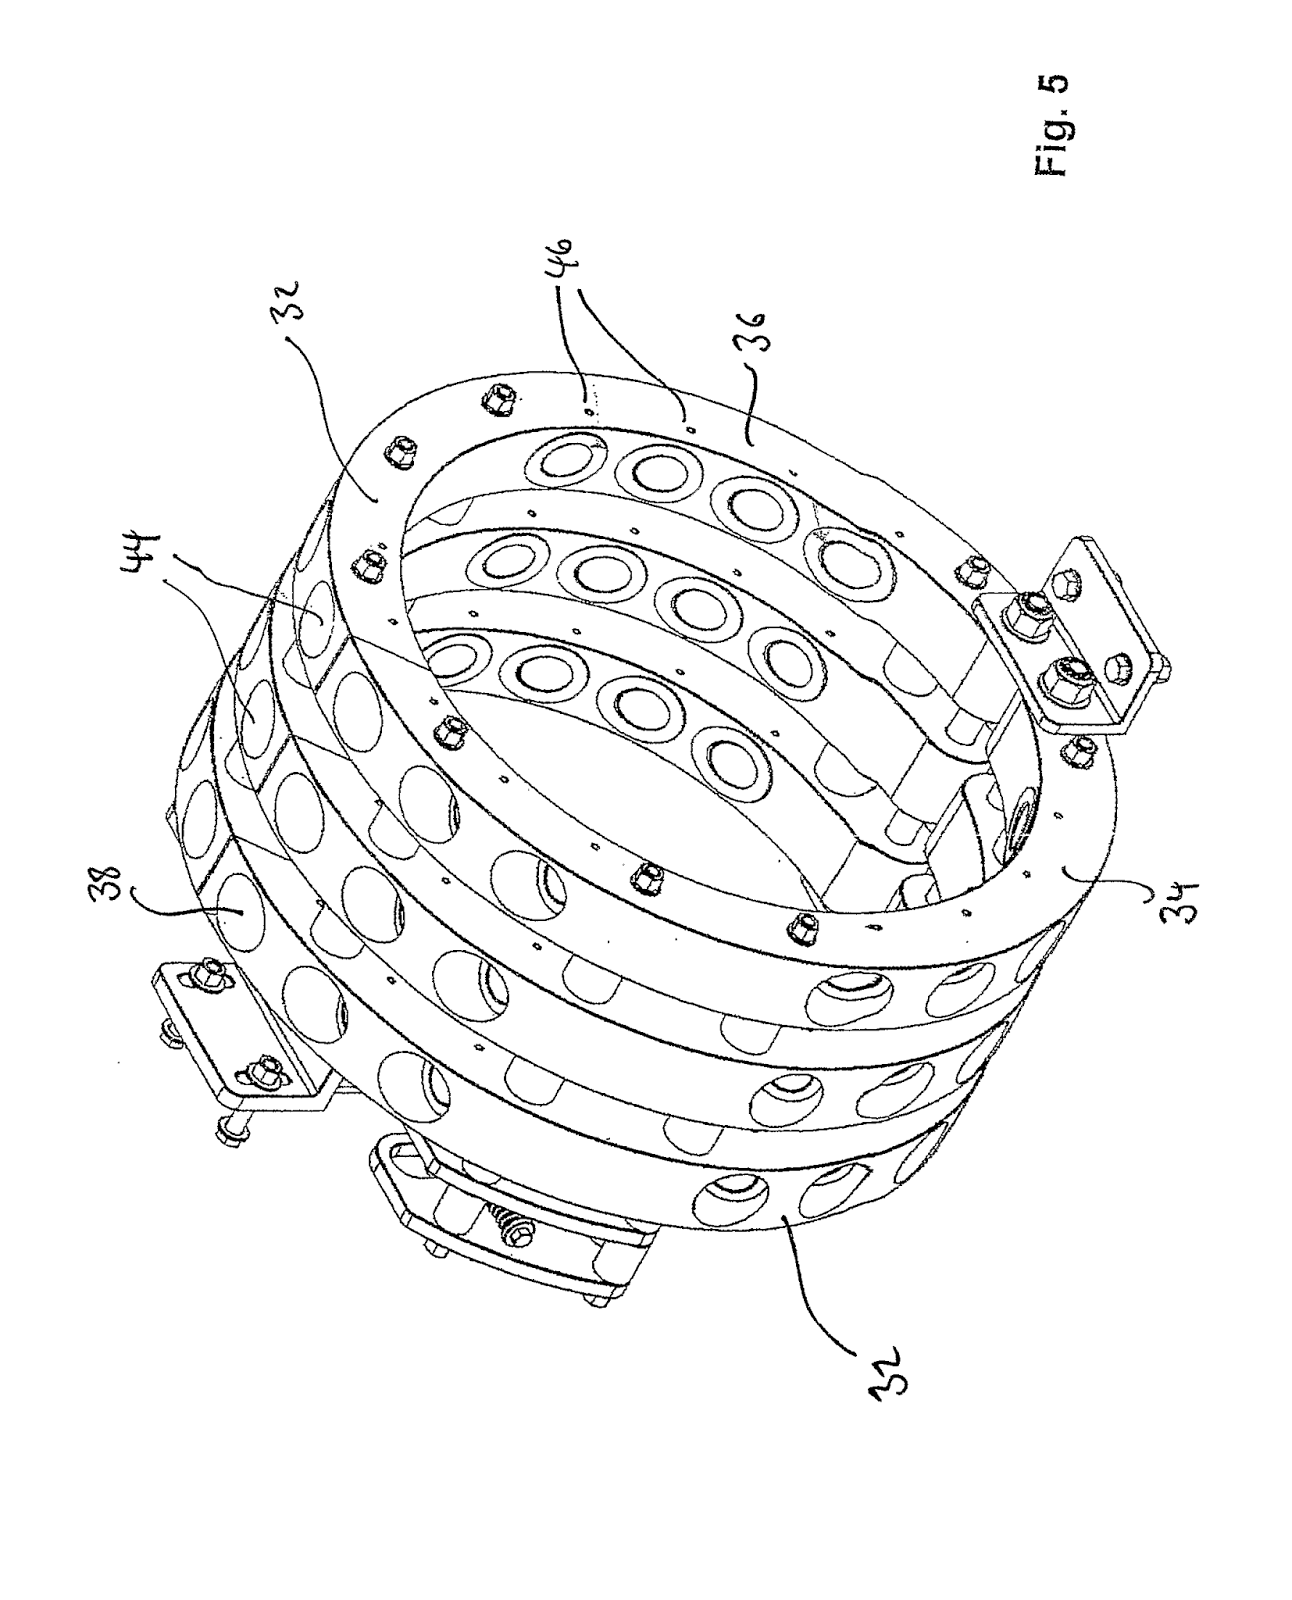 evolucionmundial net energia libre  motor magnetico lo